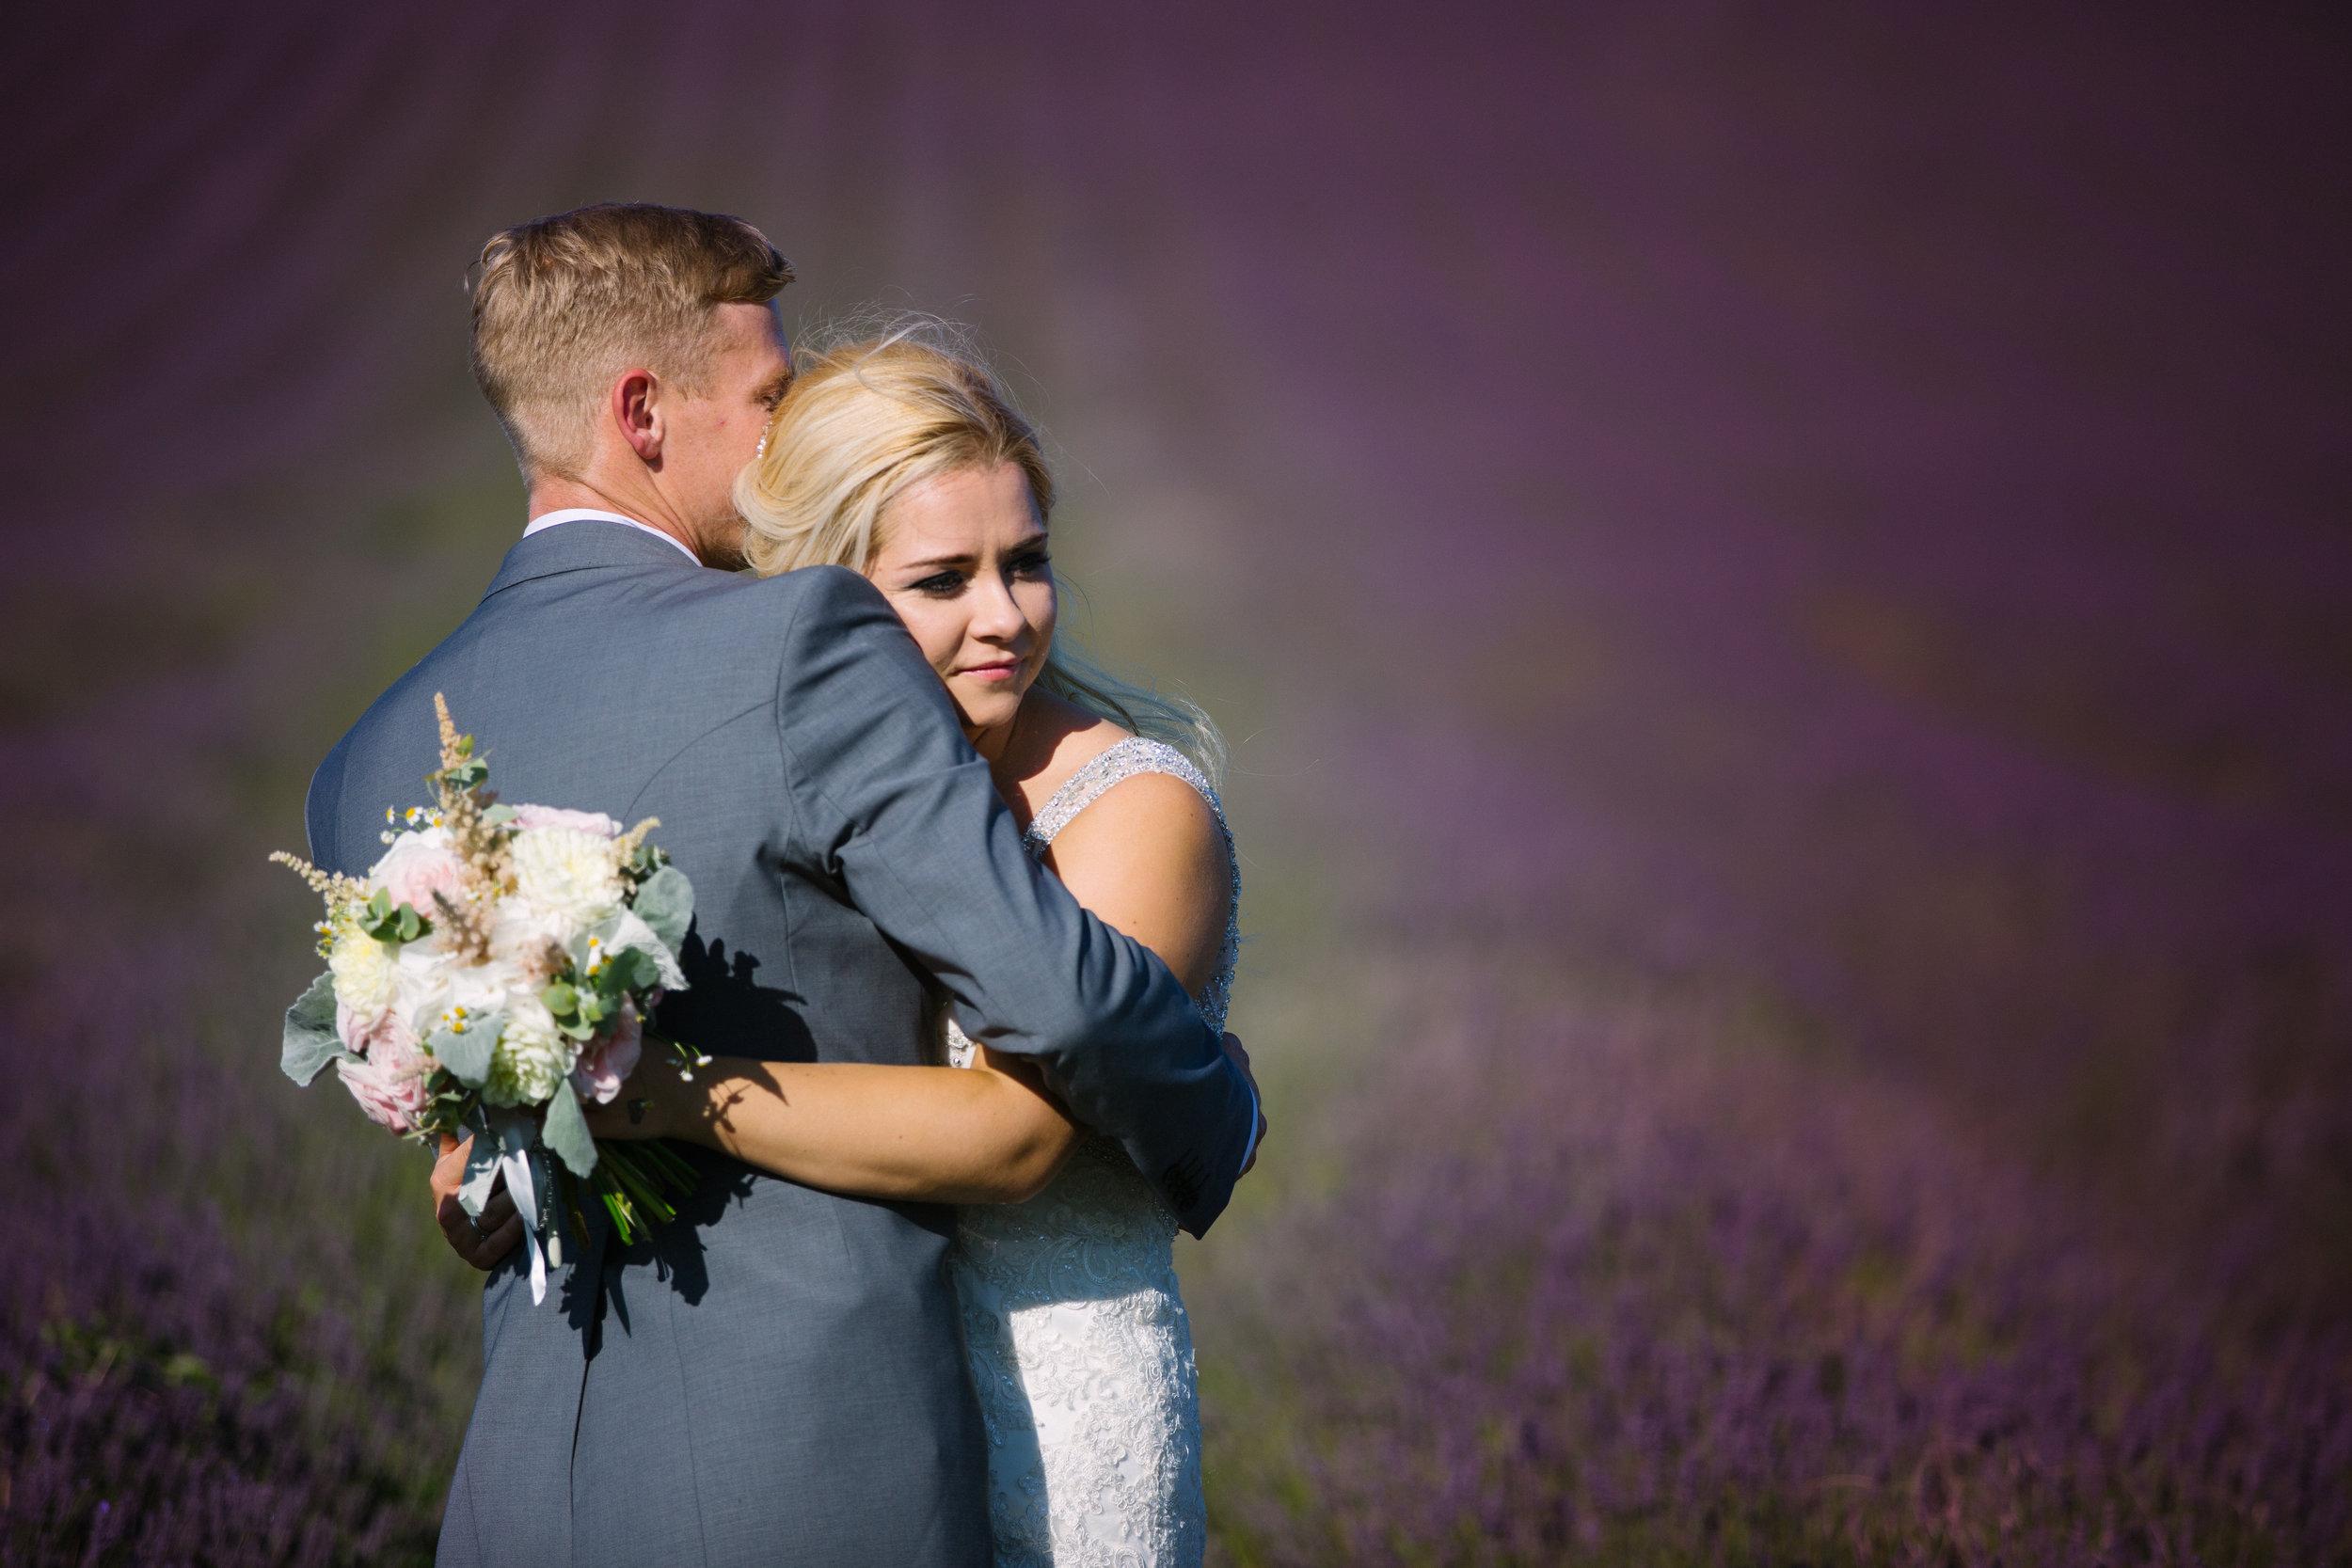 hitchin-hertfordshire-london-wedding-photography-catholic-church-lavender-field-portrait-46